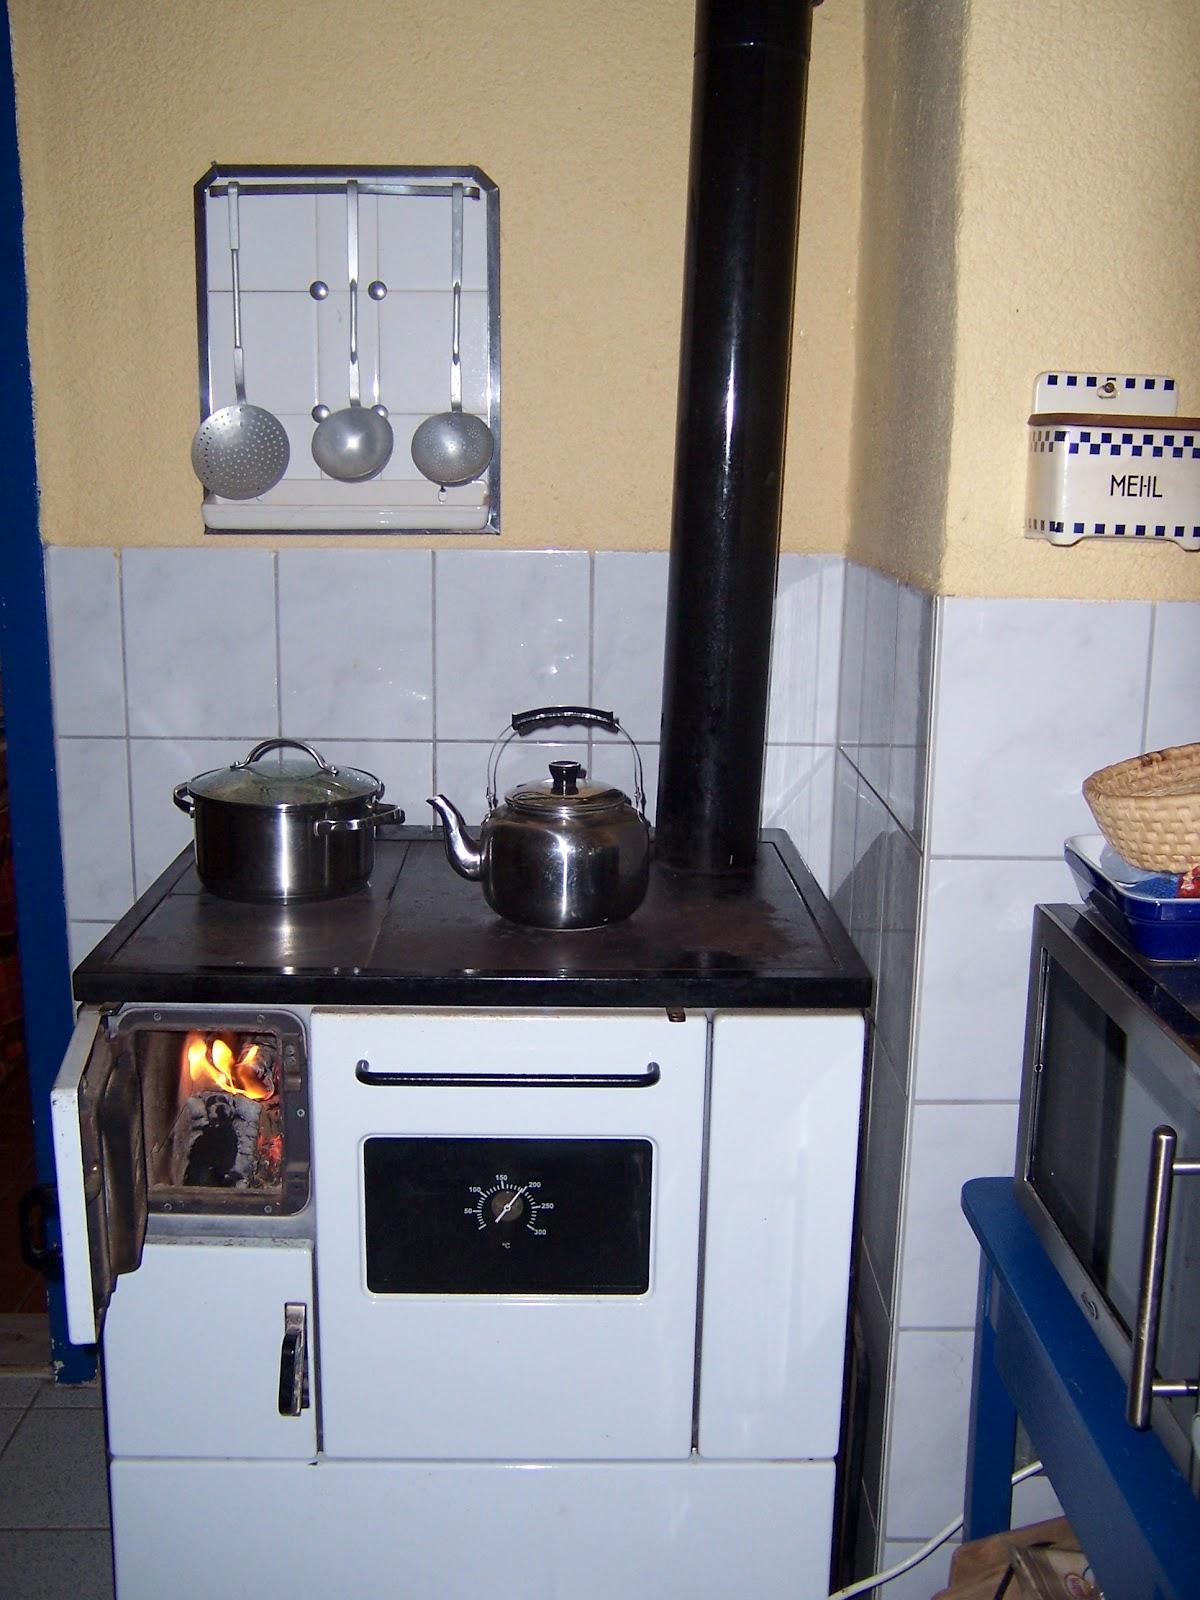 Atemberaubend Küchenhexe Nj Ideen - Küchen Design Ideen ...